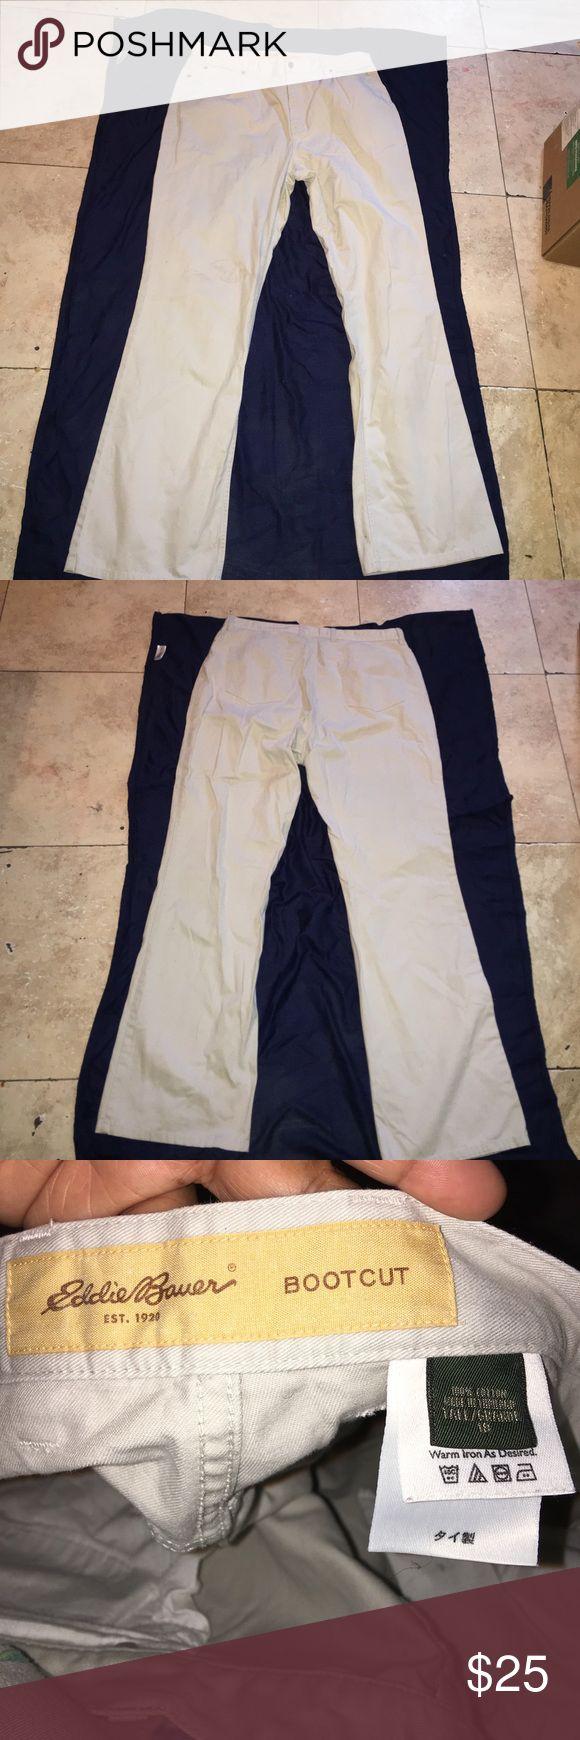 Plus Sized Eddie Bauer Khaki Pants 👖 Plus size Eddie Bauer boot cut khaki pants size 18 tall grand plus size Eddie Bauer Pants Boot Cut & Flare